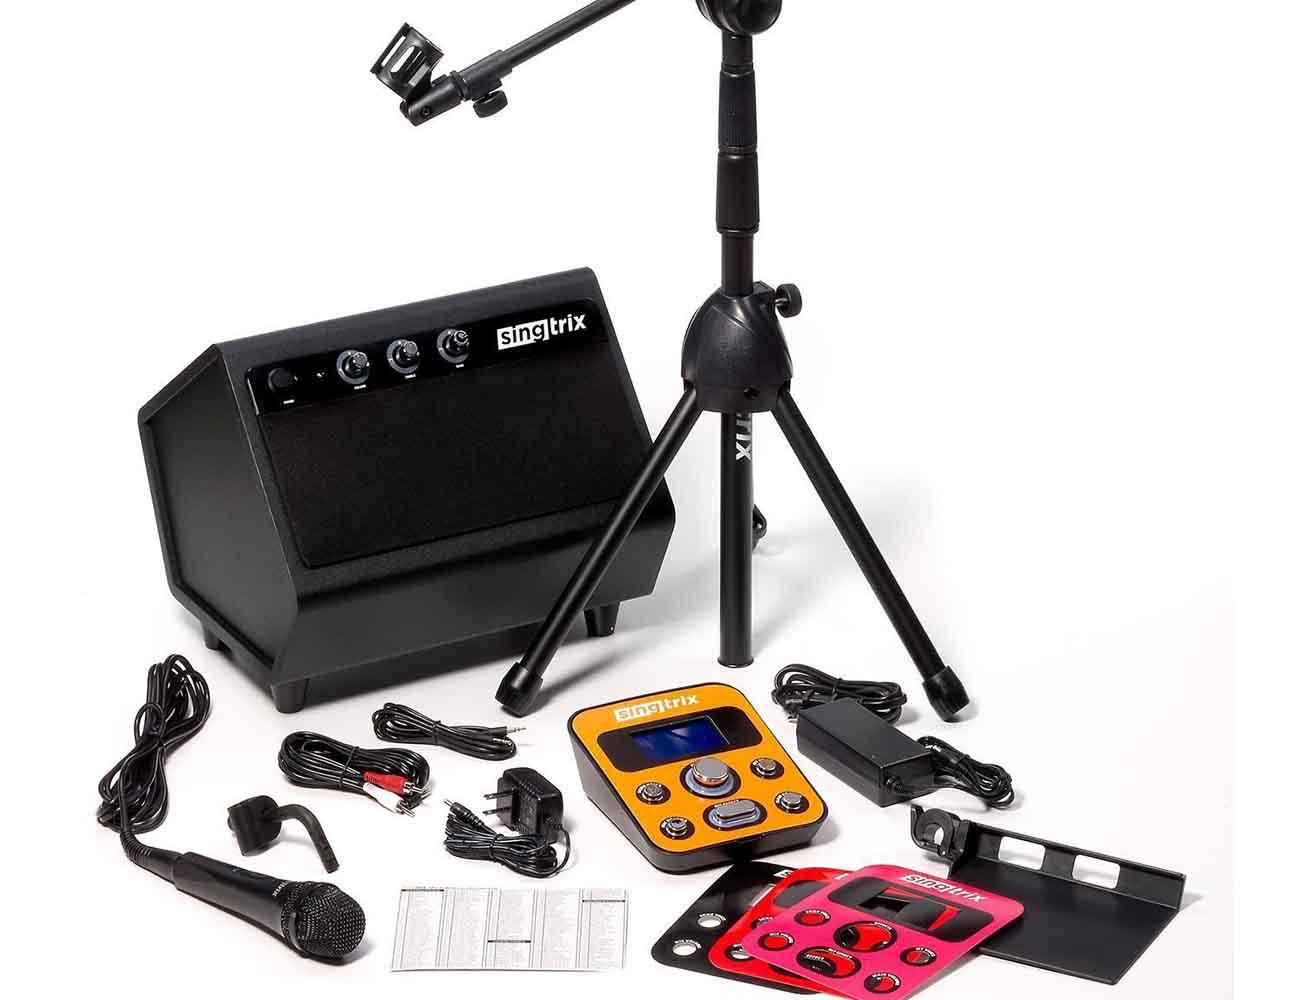 Singtrix Home Karaoke System Party Bundle Edition